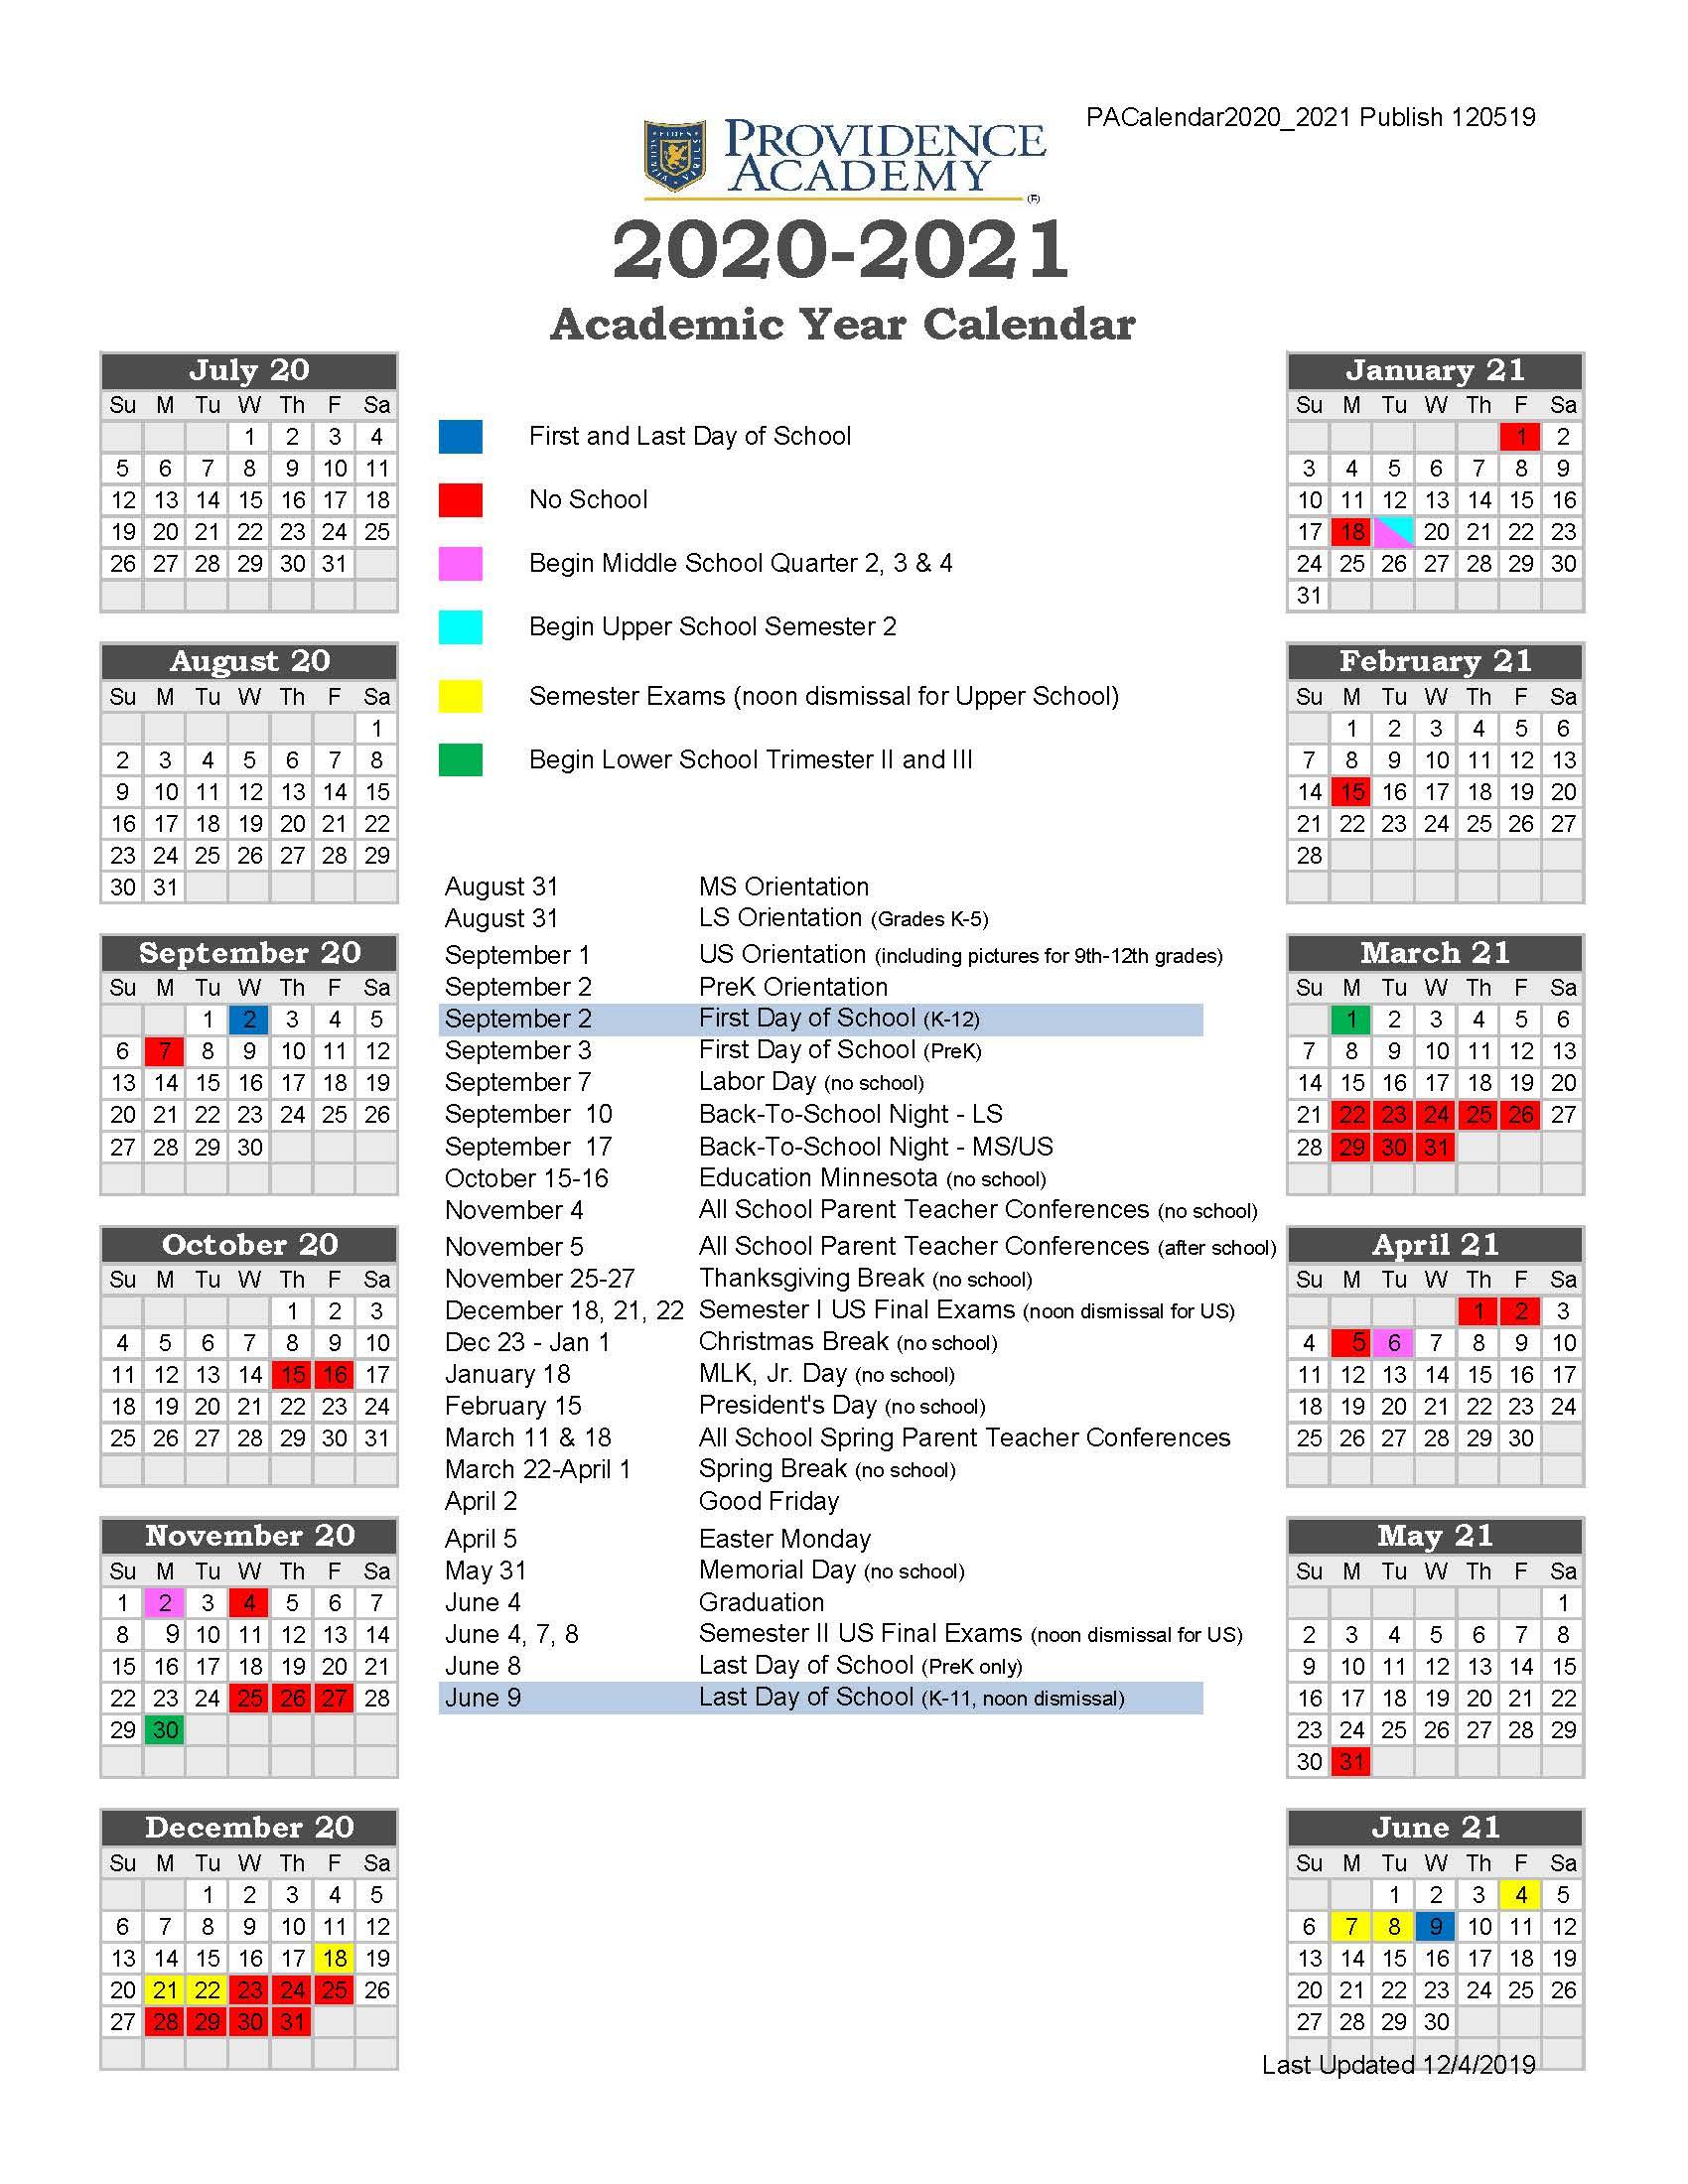 19-20_Providence-Academy-Academic-Calendar-2020-2021 for White Bear Lake Calendar Handbook 2021 2021